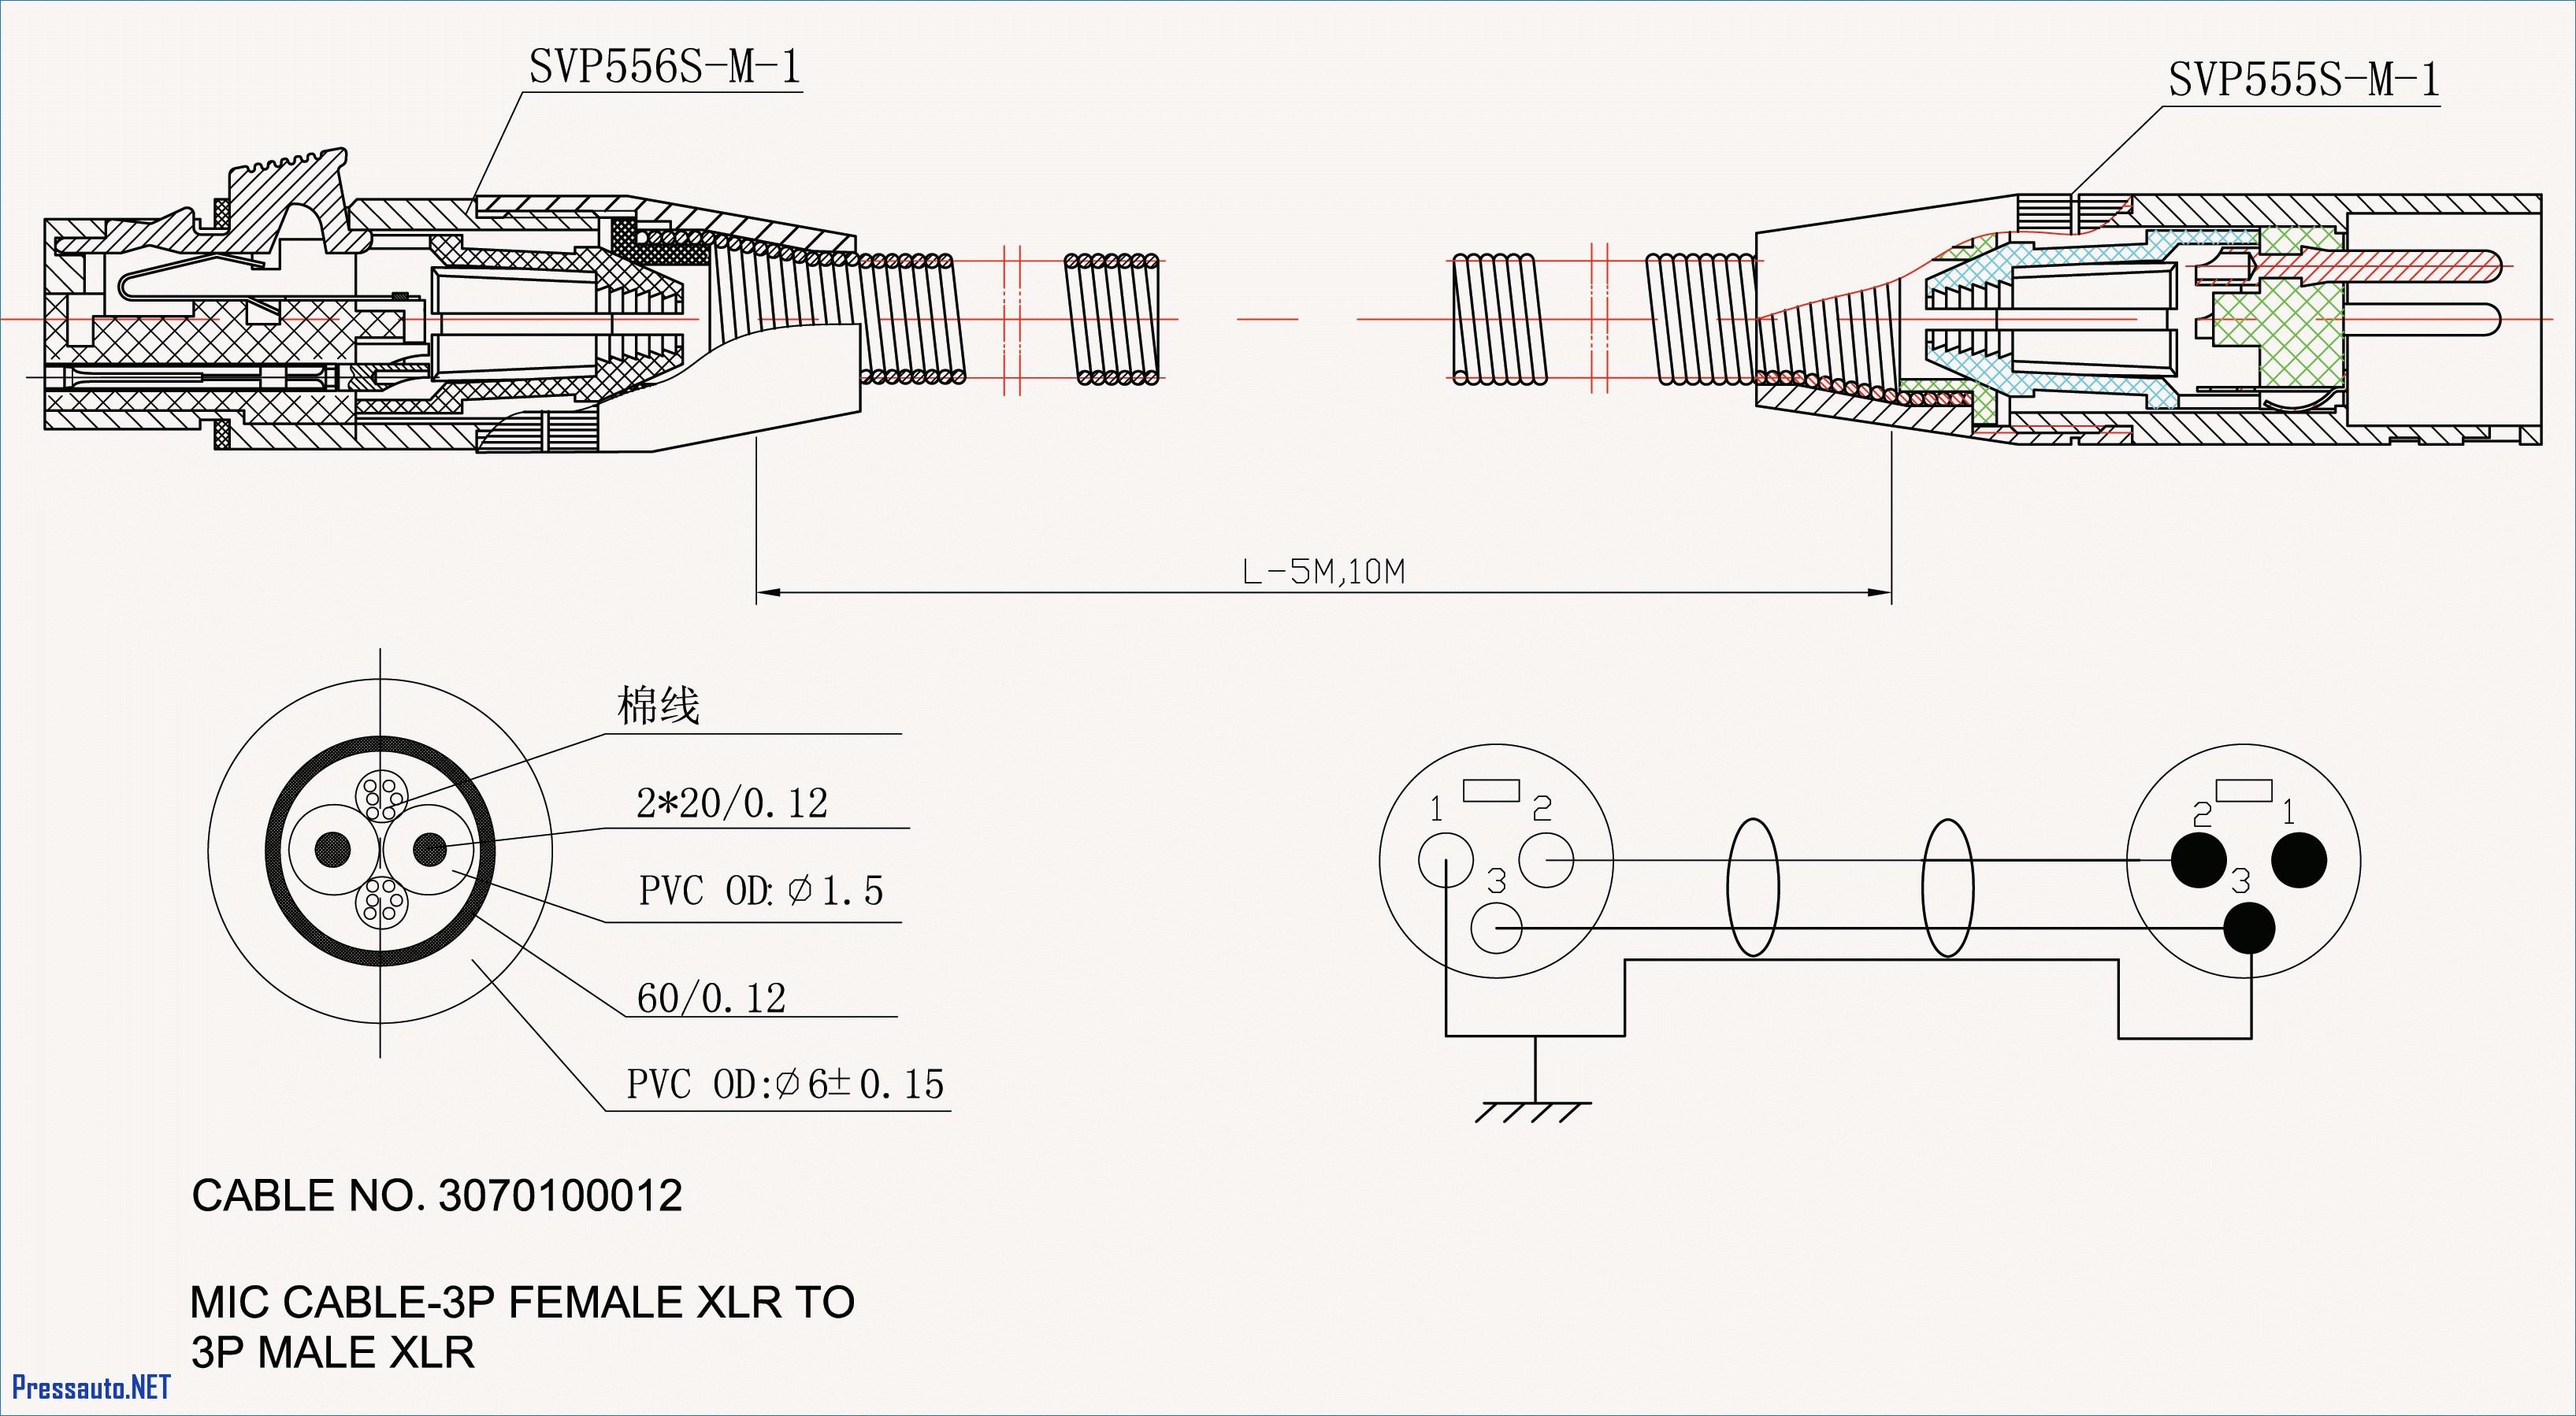 5 Wire Condenser Fan Motor Wiring Diagram Trusted Schematics For 3 Speed Fx2 75x Unique Image Ac